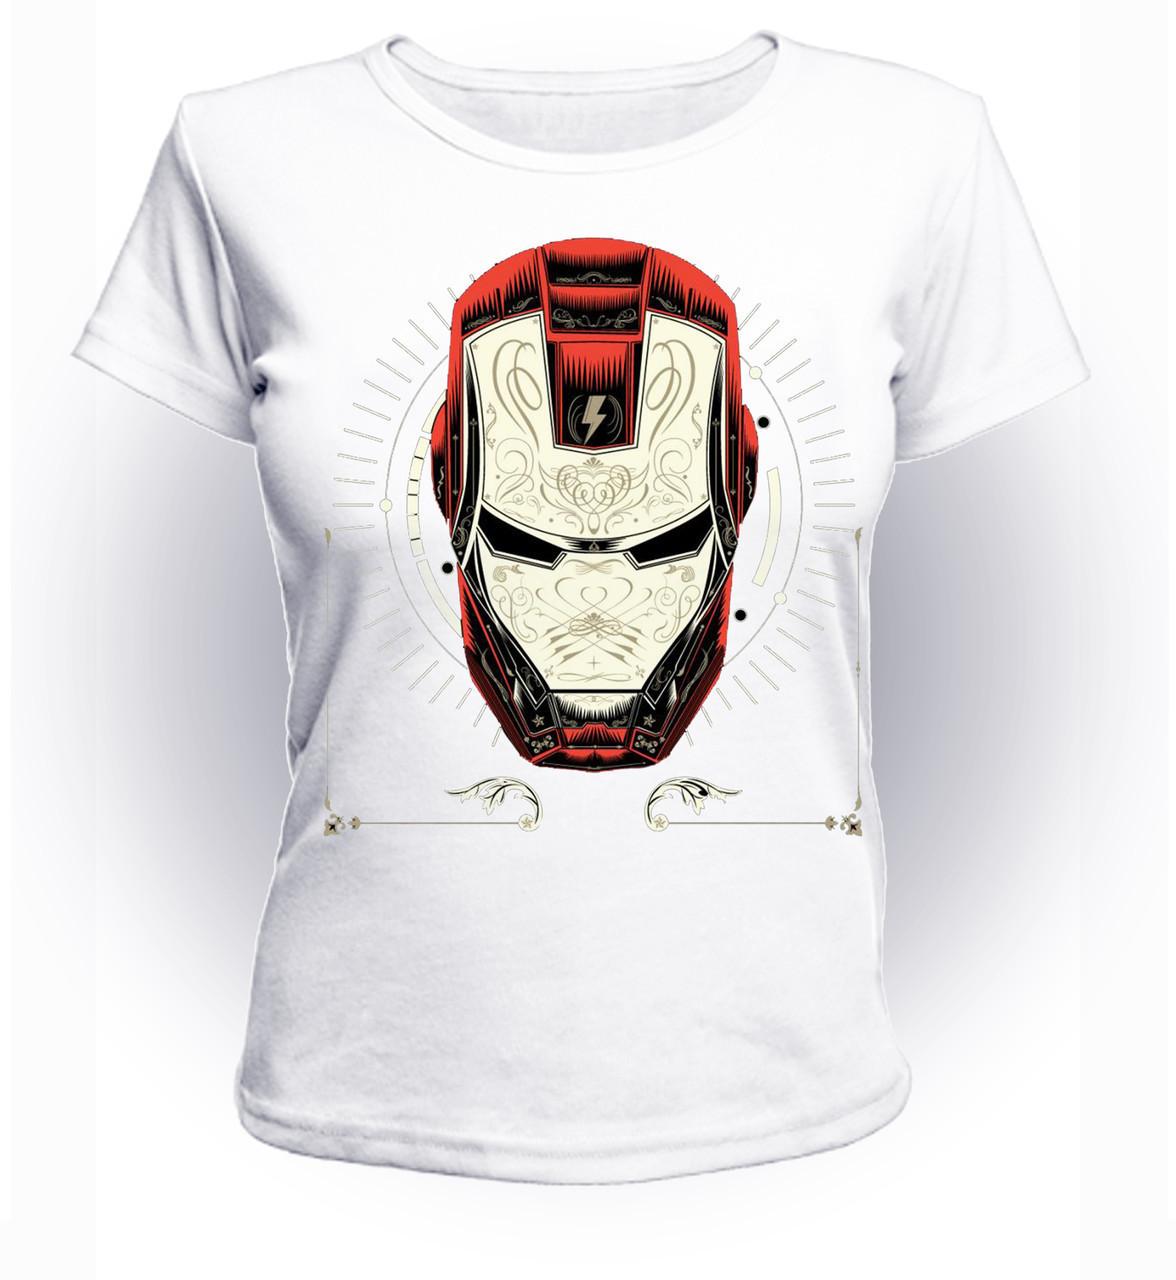 5fbef7f78c68 Футболка женская GeekLand Железный Человек Rock Iron Man art IM.01.045, цена  250 грн., купить в Одессе — Prom.ua (ID#645094770)